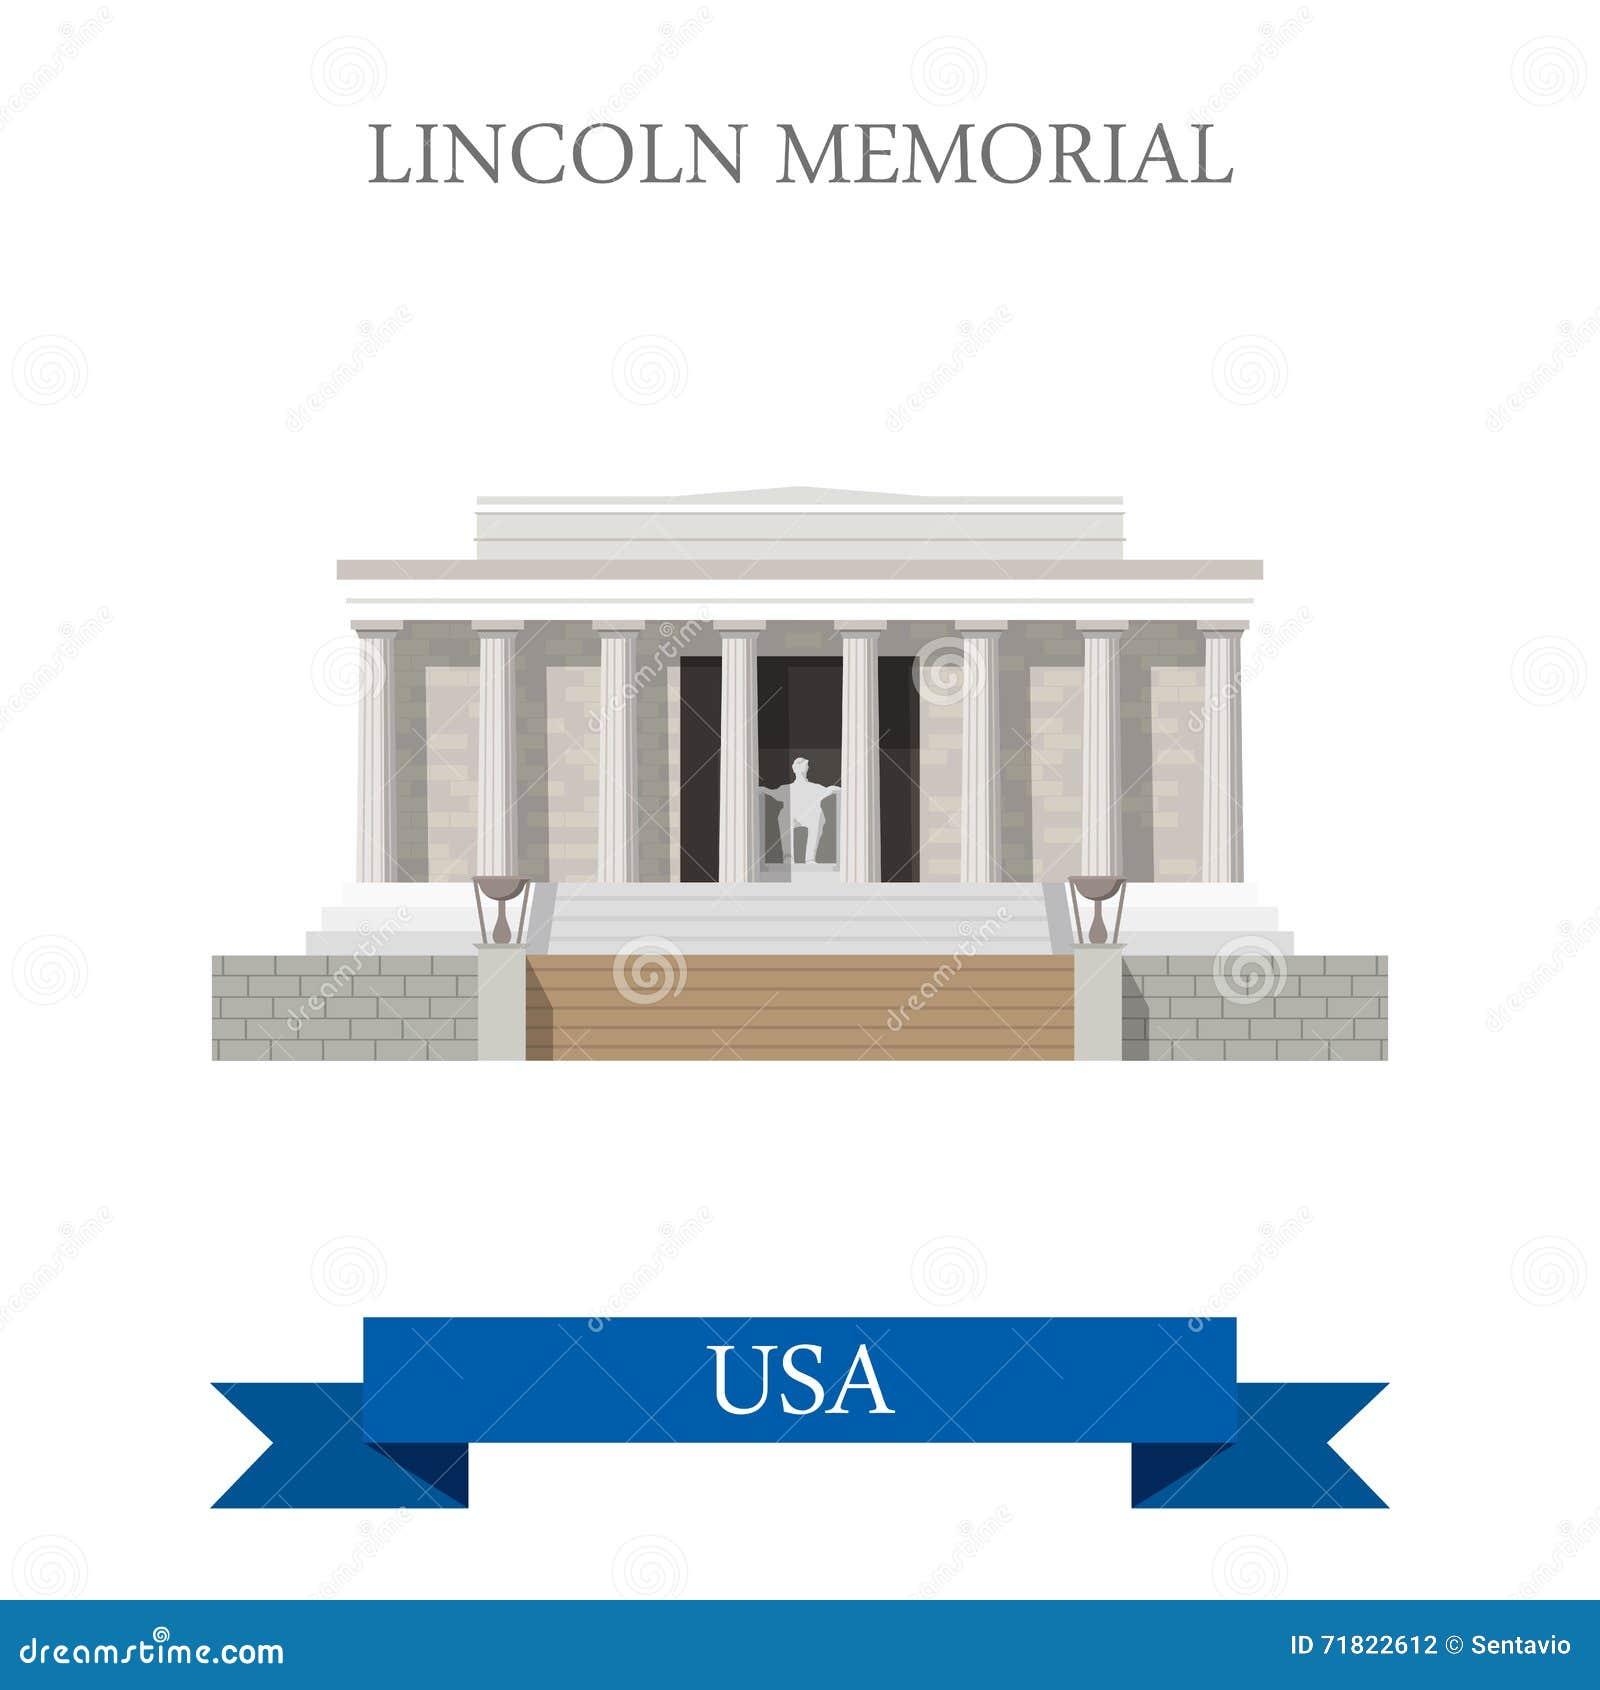 Lincoln Memorial in Washington United States vlak